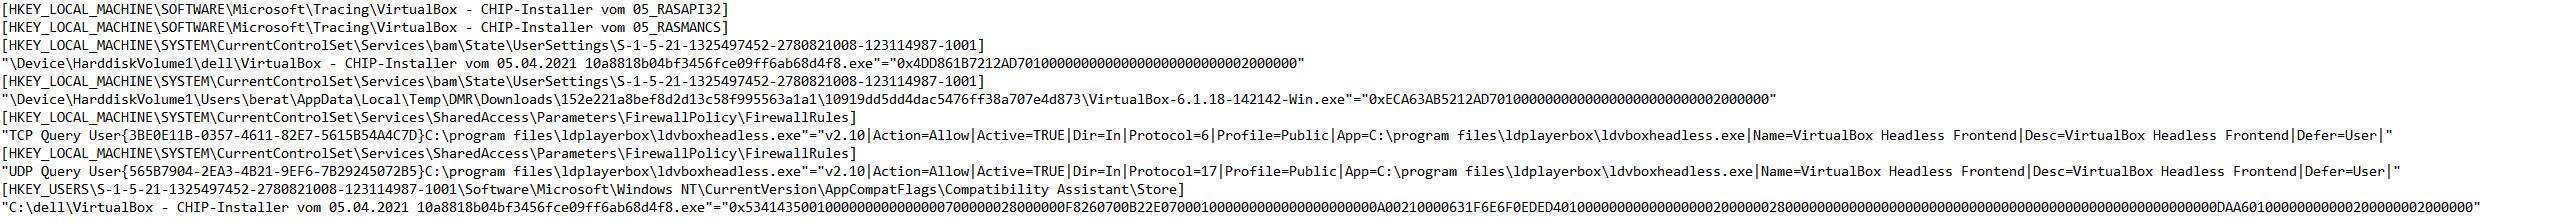 Screenshot 2021-04-06 173135.png